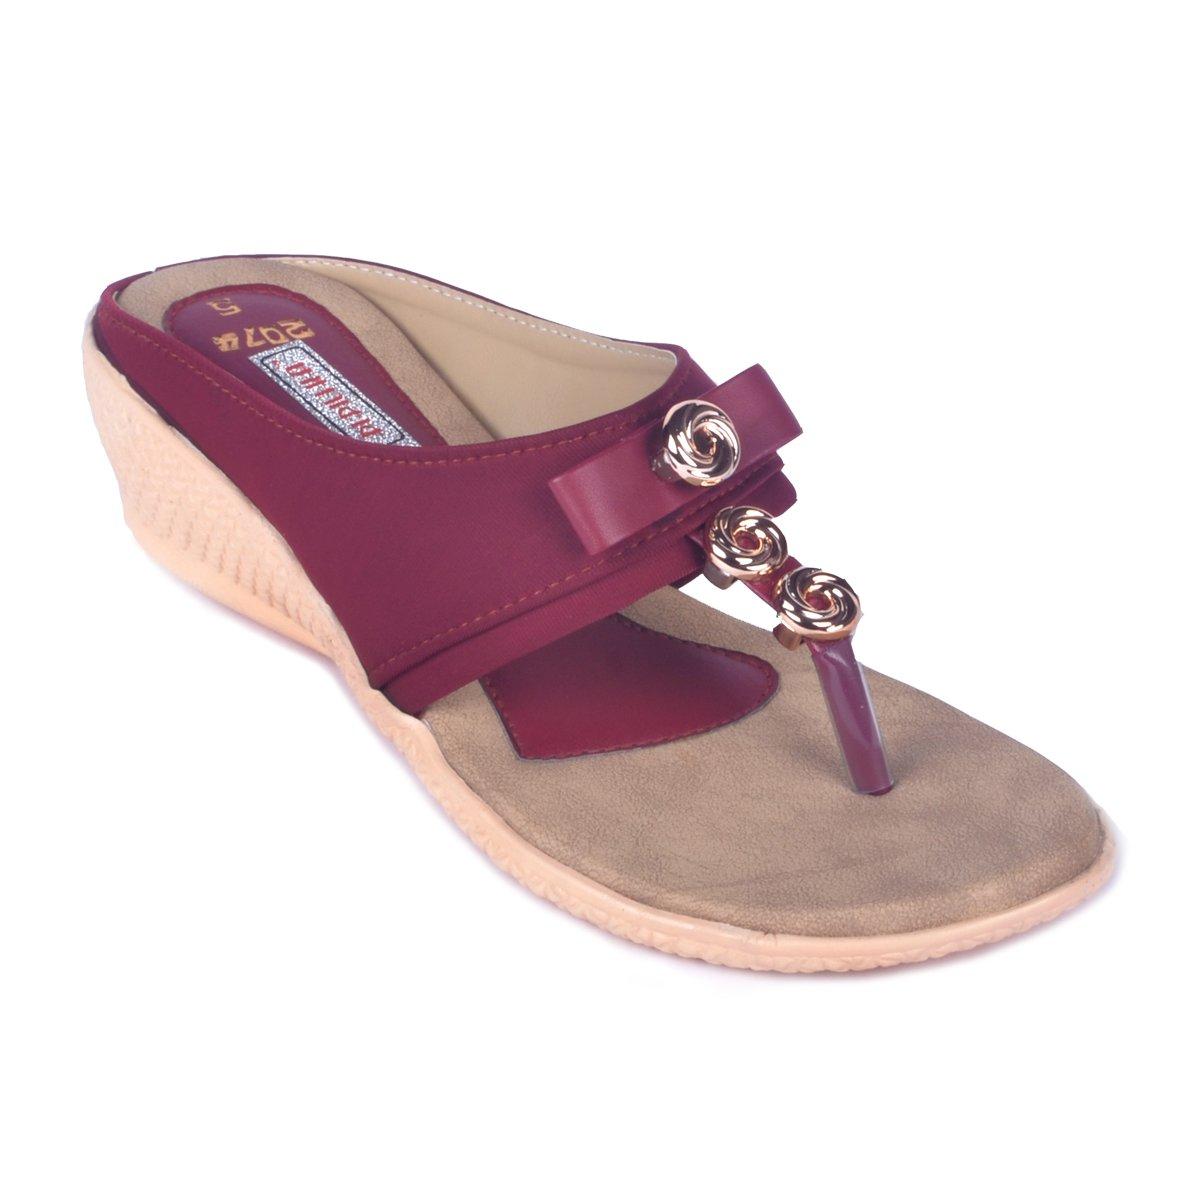 Womens sandals flipkart - Csimpv0viaehruf Jpg